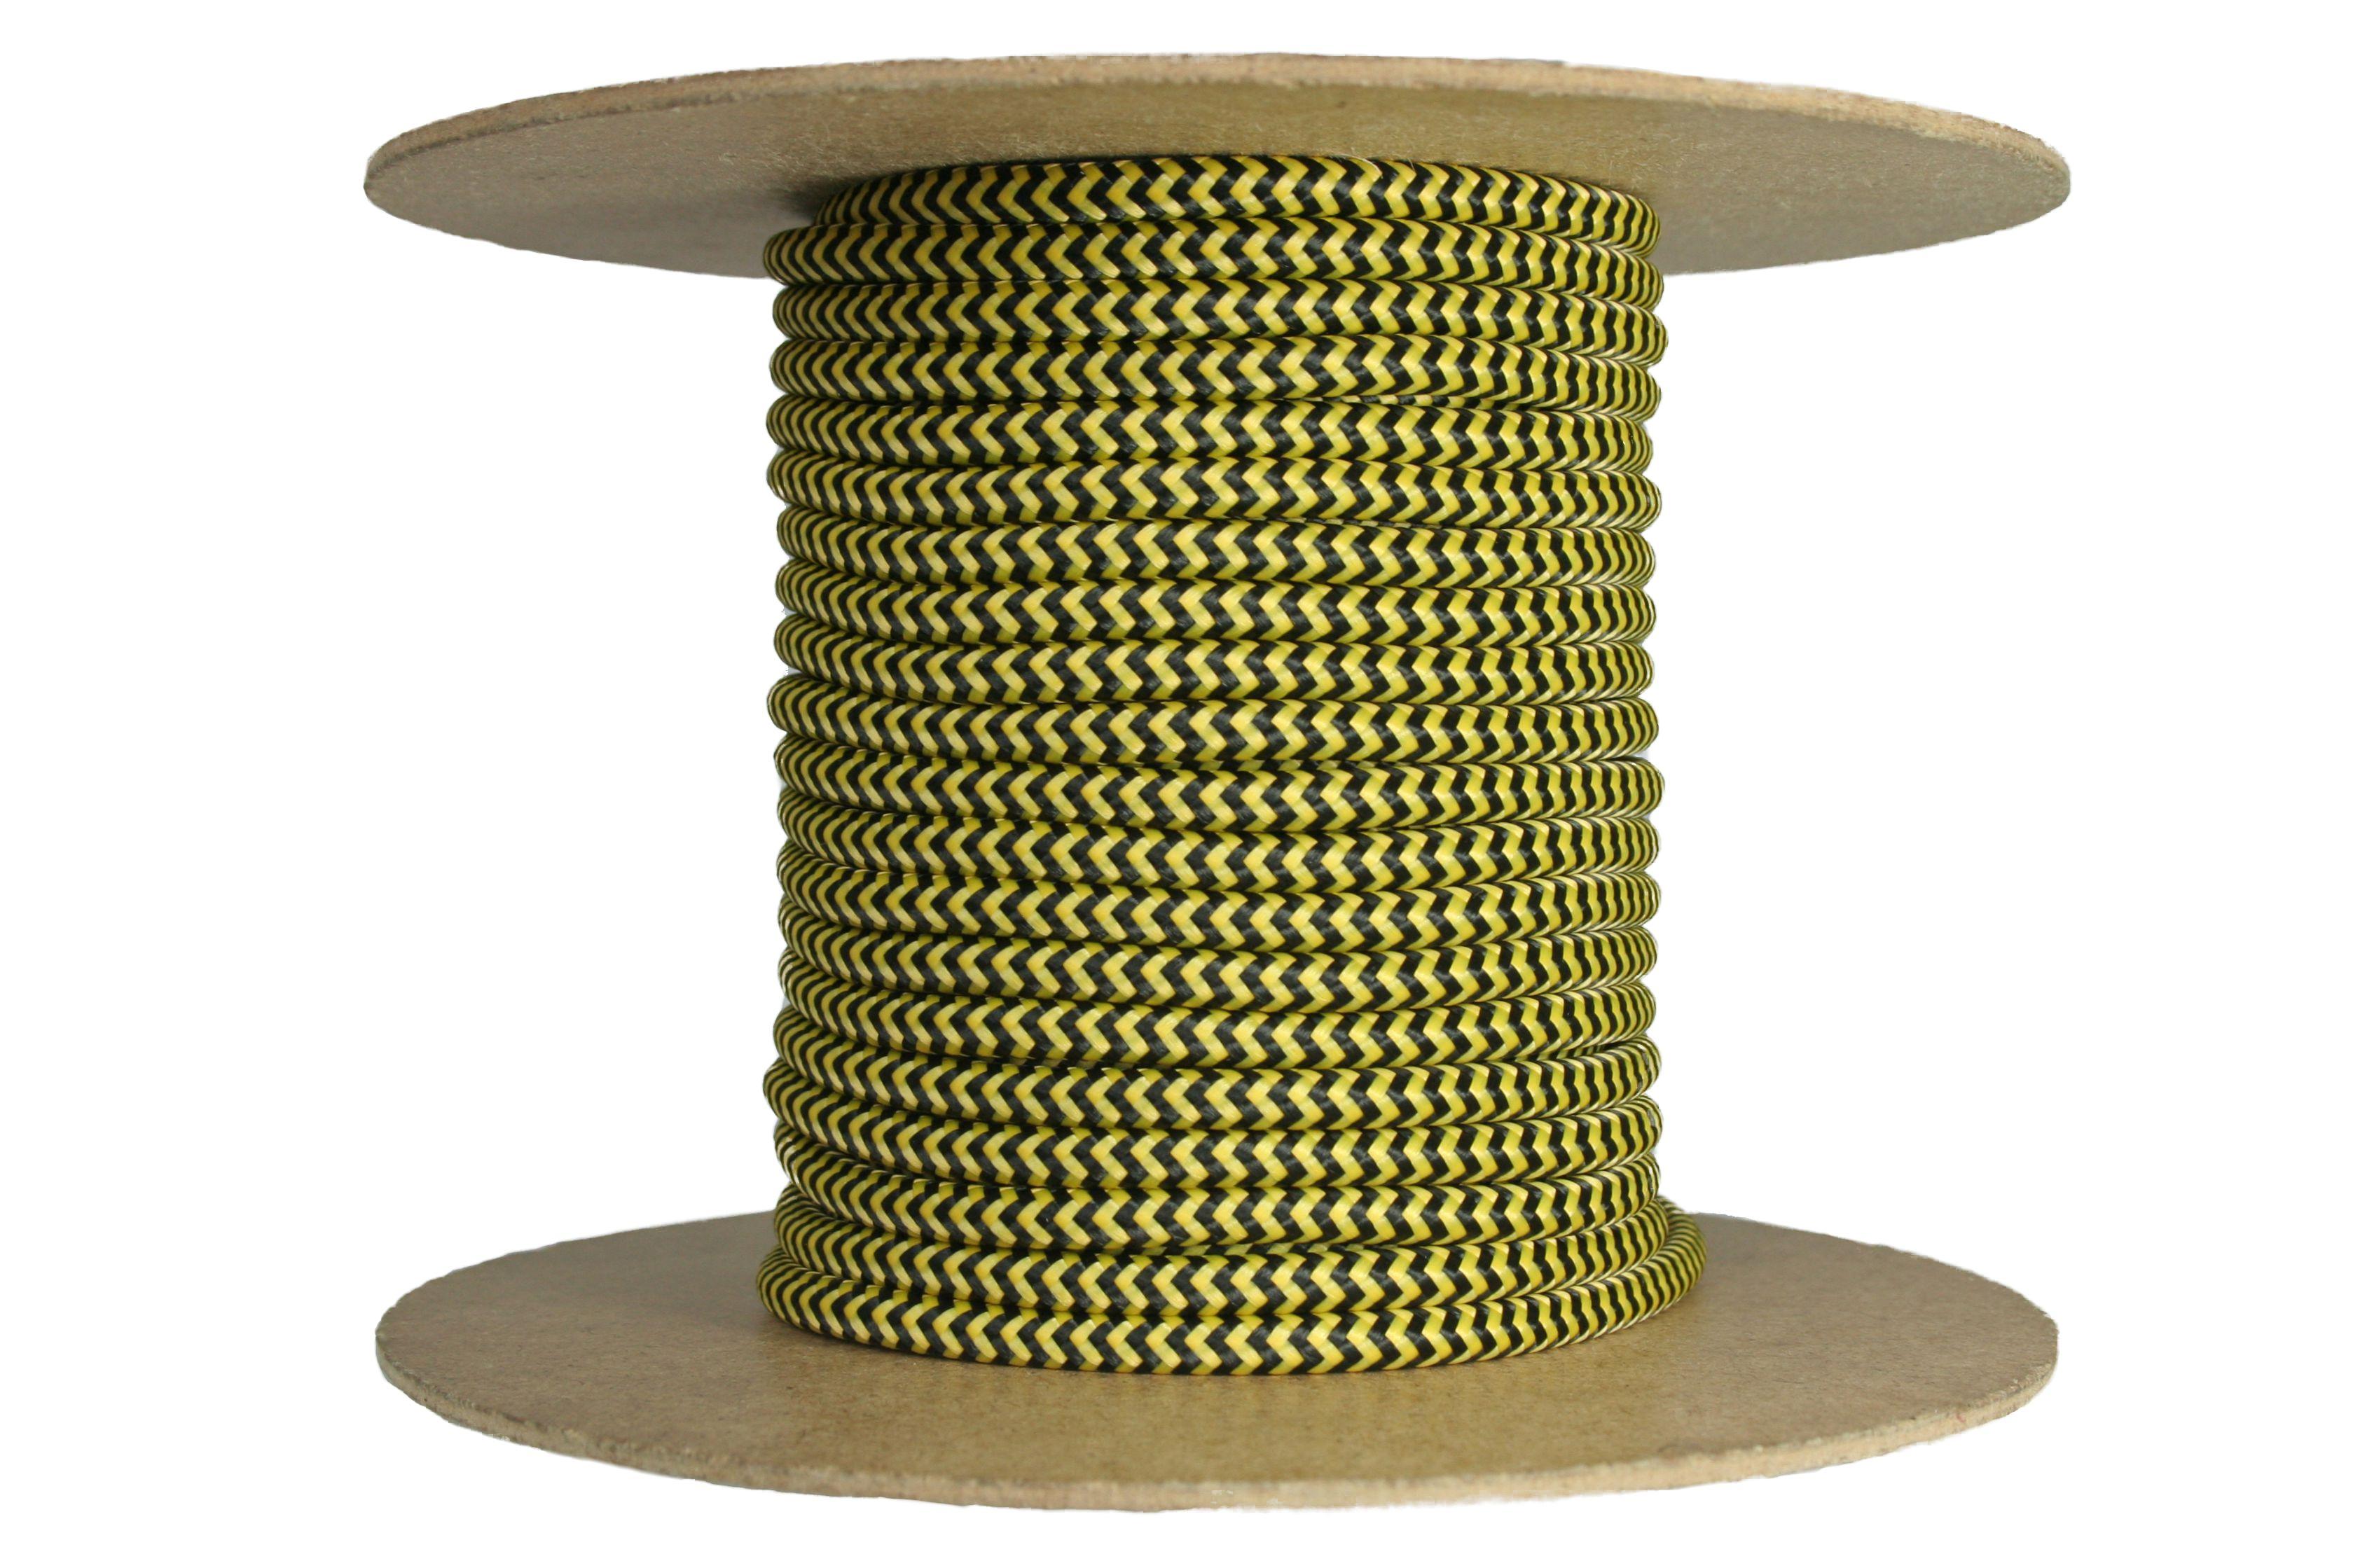 Oplot na kablach JD0215